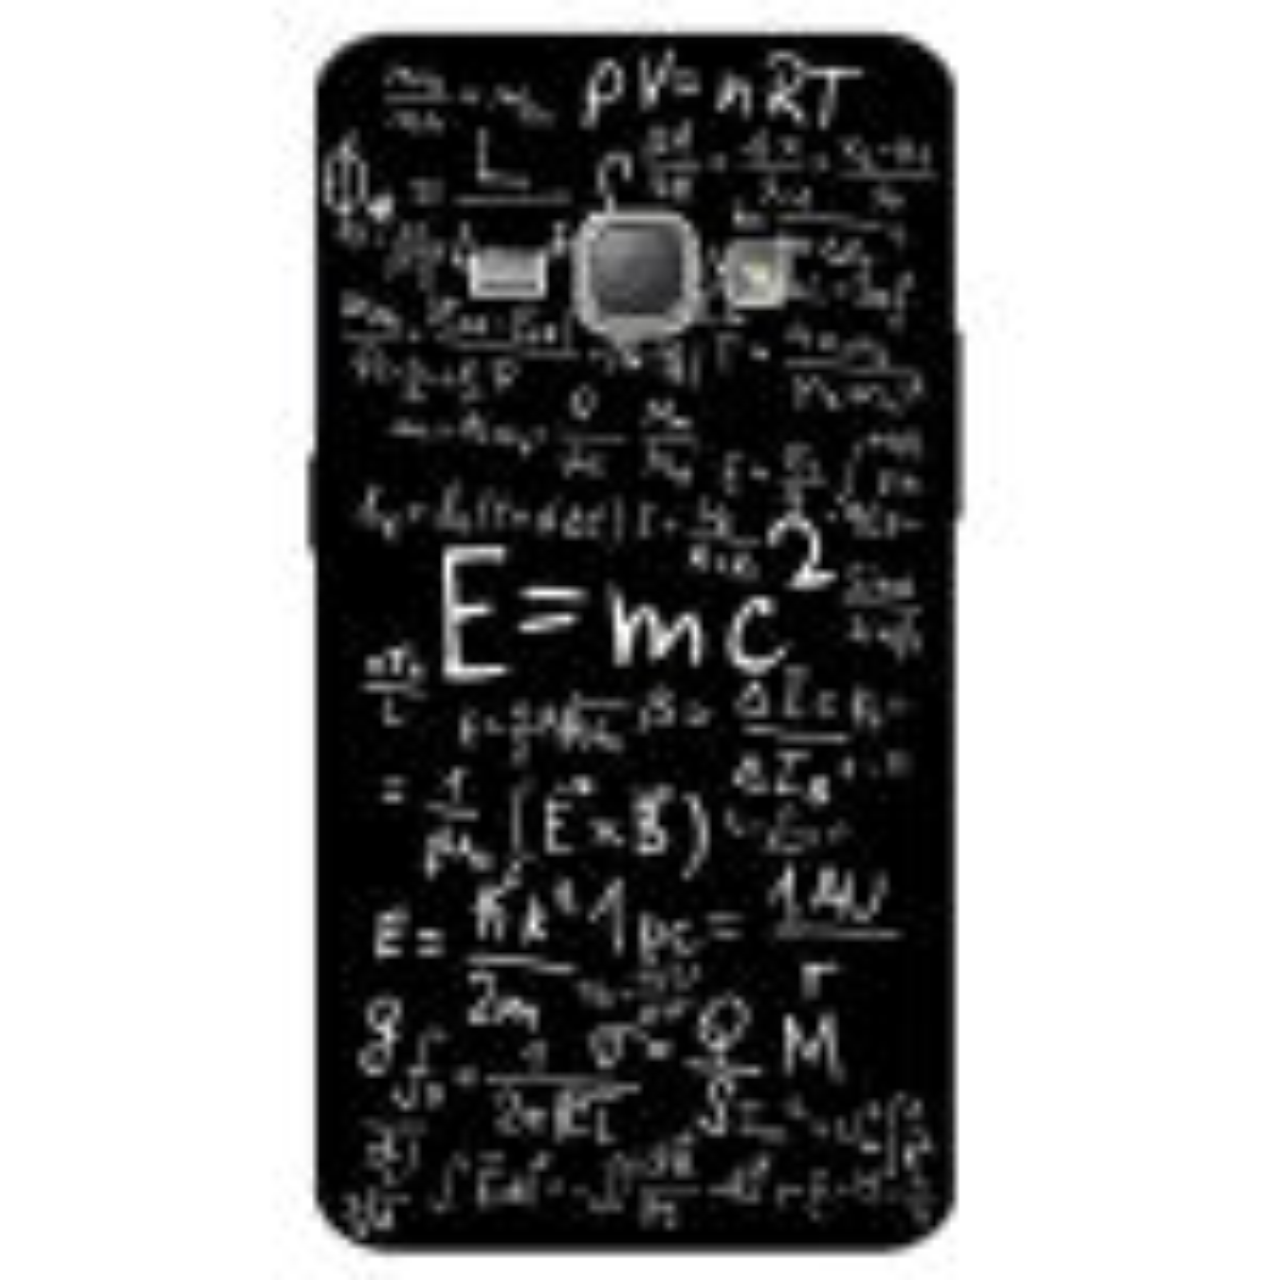 کاور کی اچ کد6297 مناسب برای گوشی موبایل سامسونگ Galaxy J2 2016